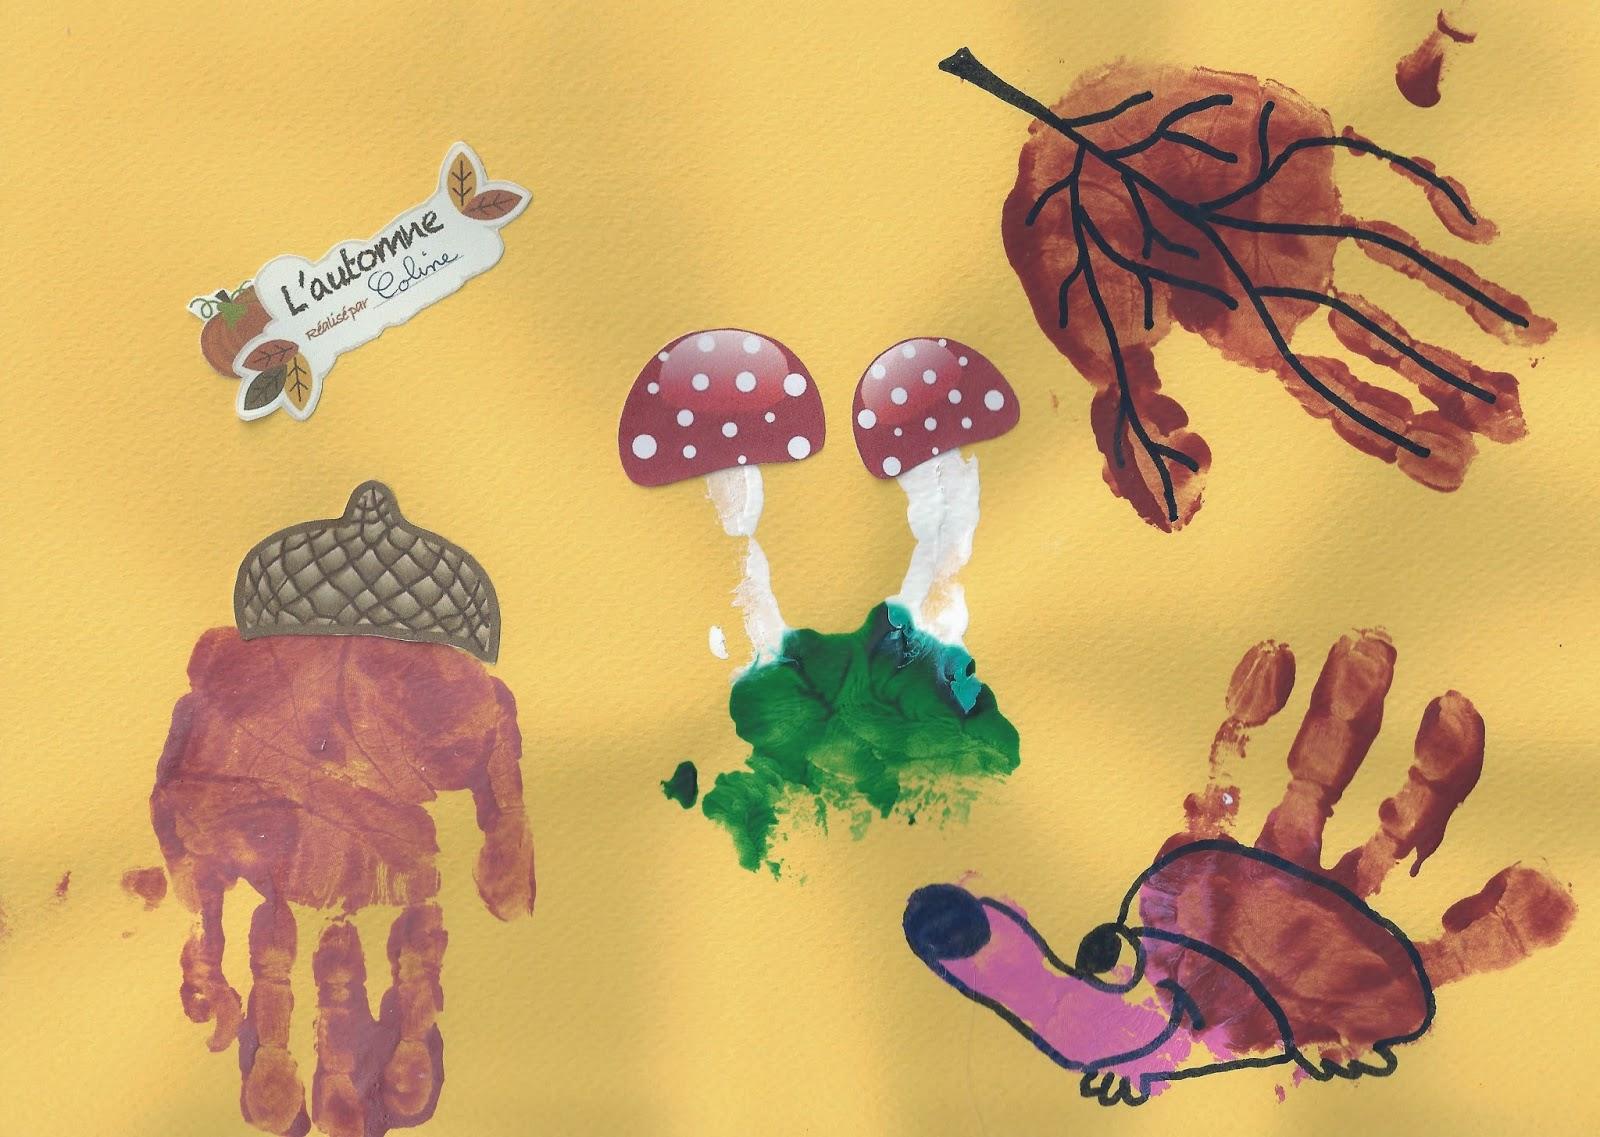 L'automne en empreintes de mains